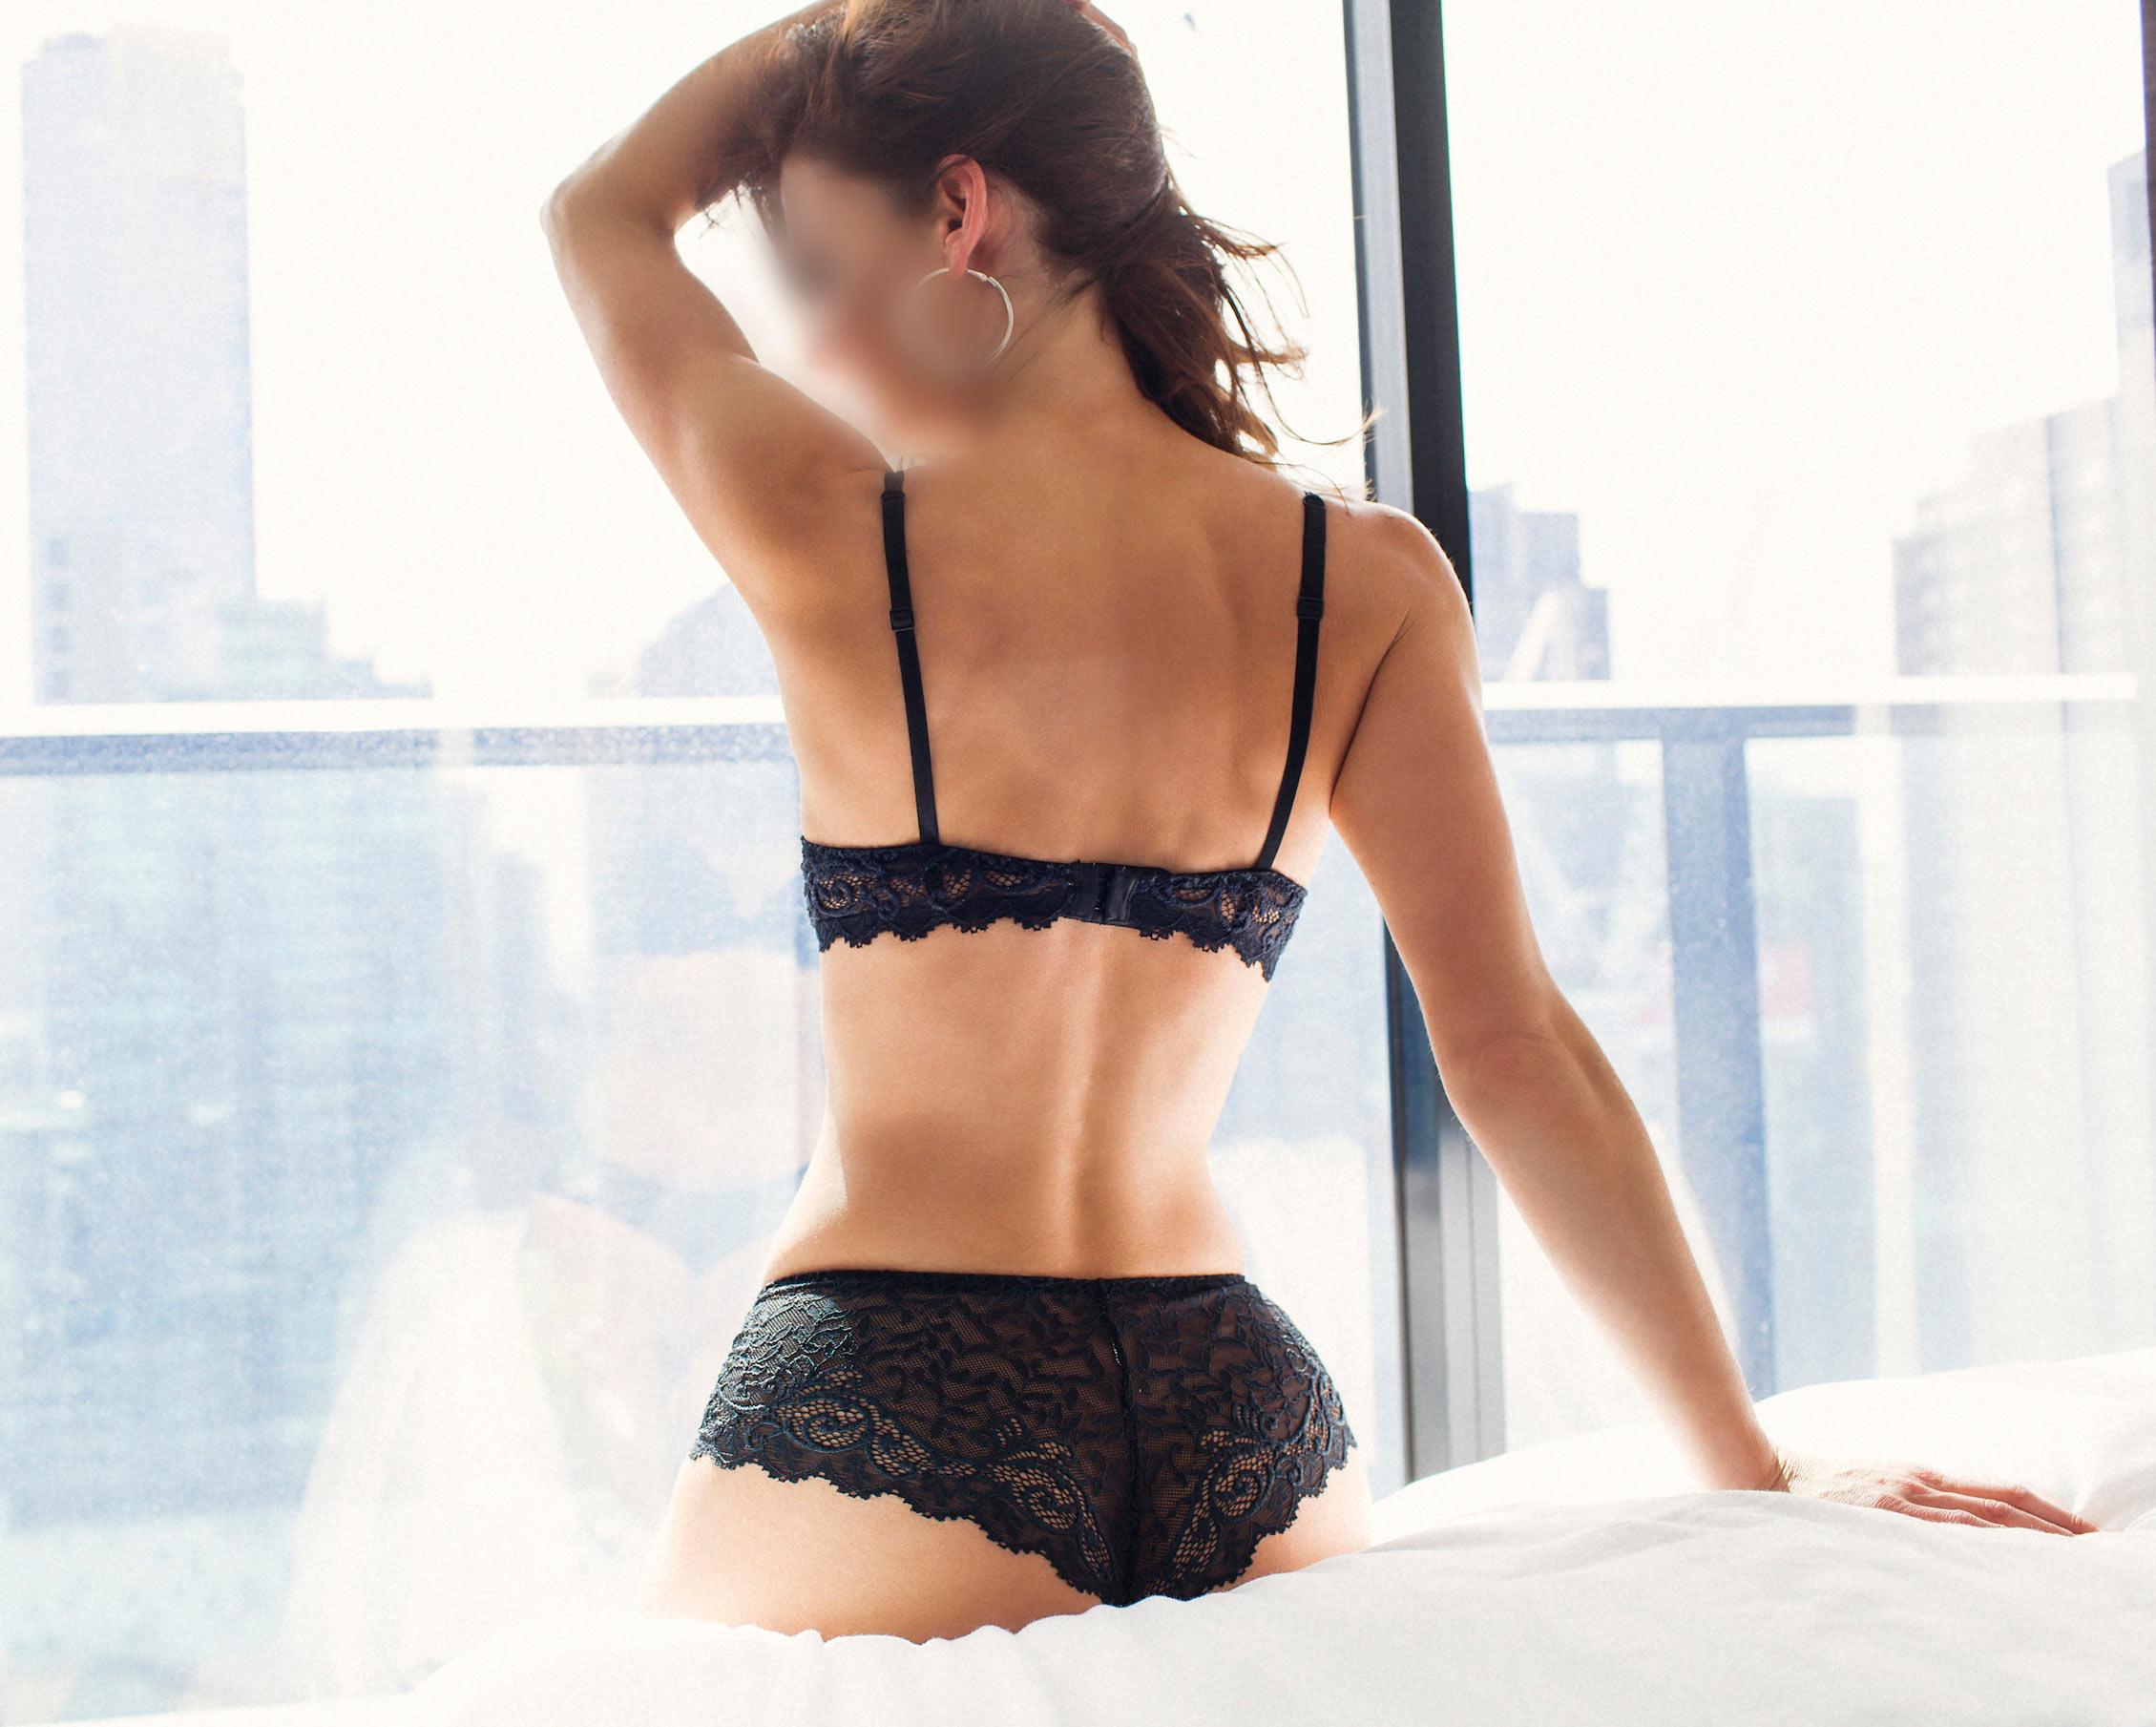 Emmy_Eden_Private_Escort_Sexy_Lingerie_04.jpg